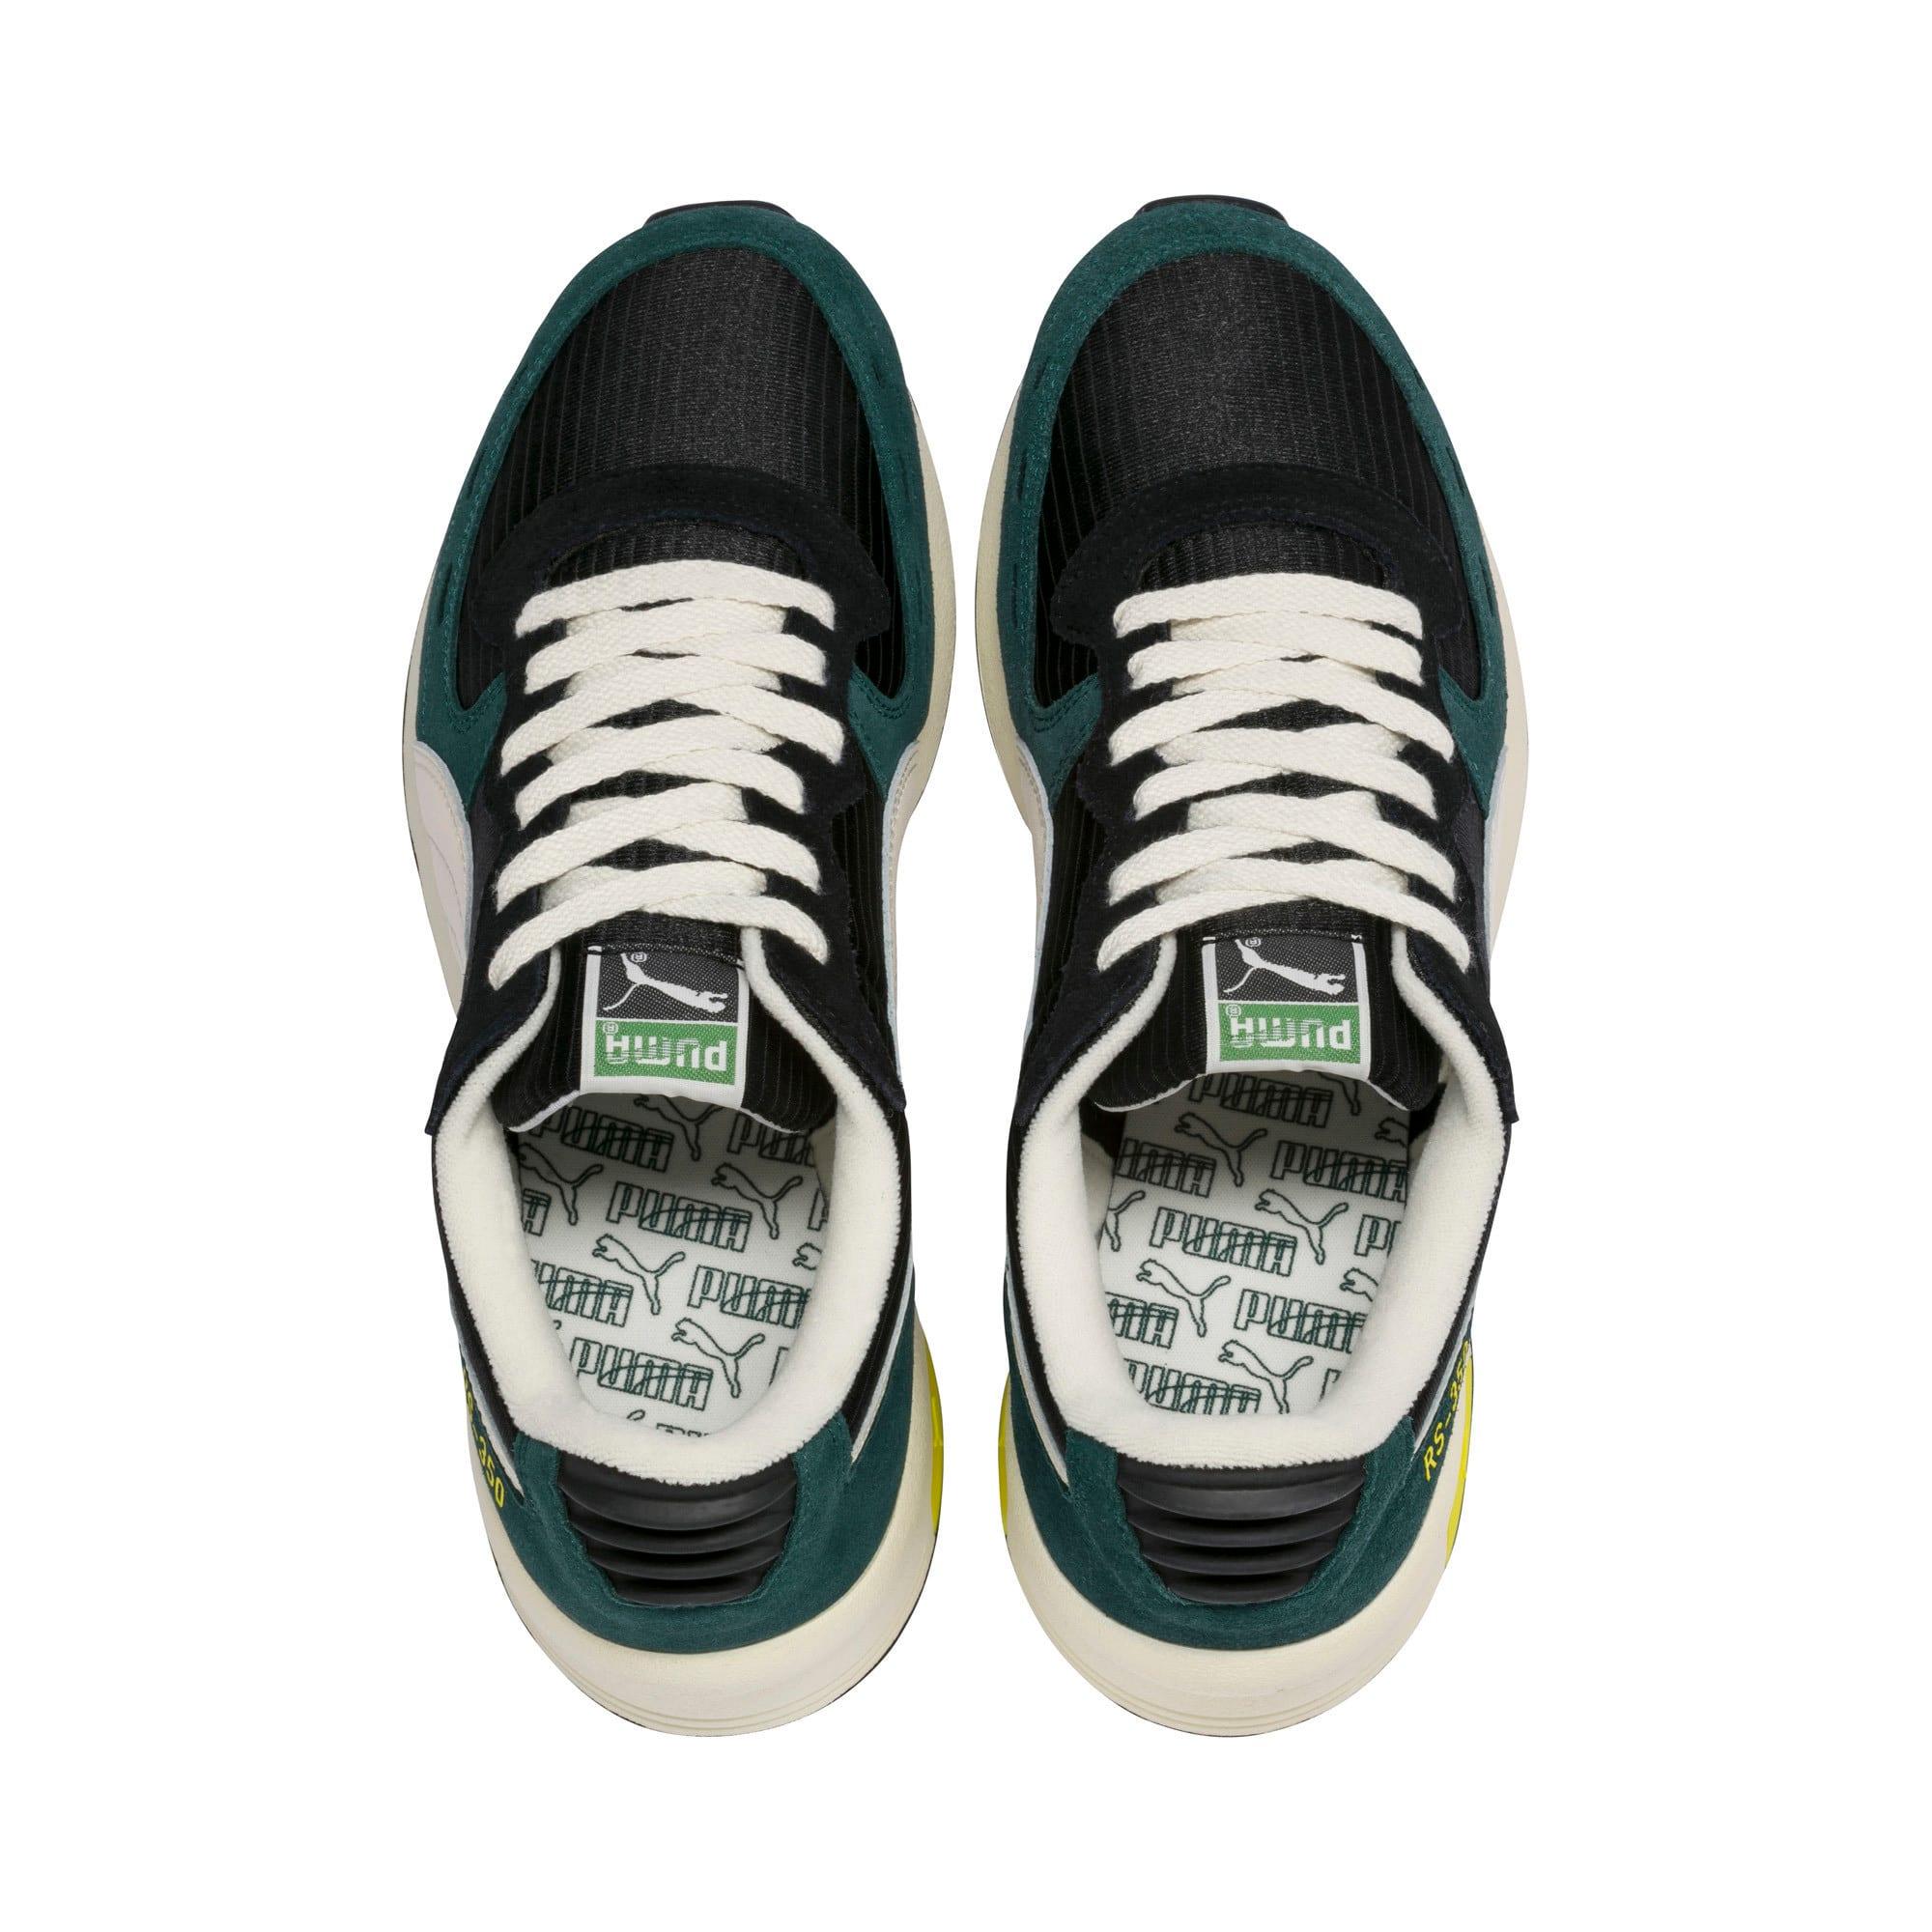 Thumbnail 7 of RS-350 OG Men's Sneakers, Puma Black-Ponderosa Pine, medium